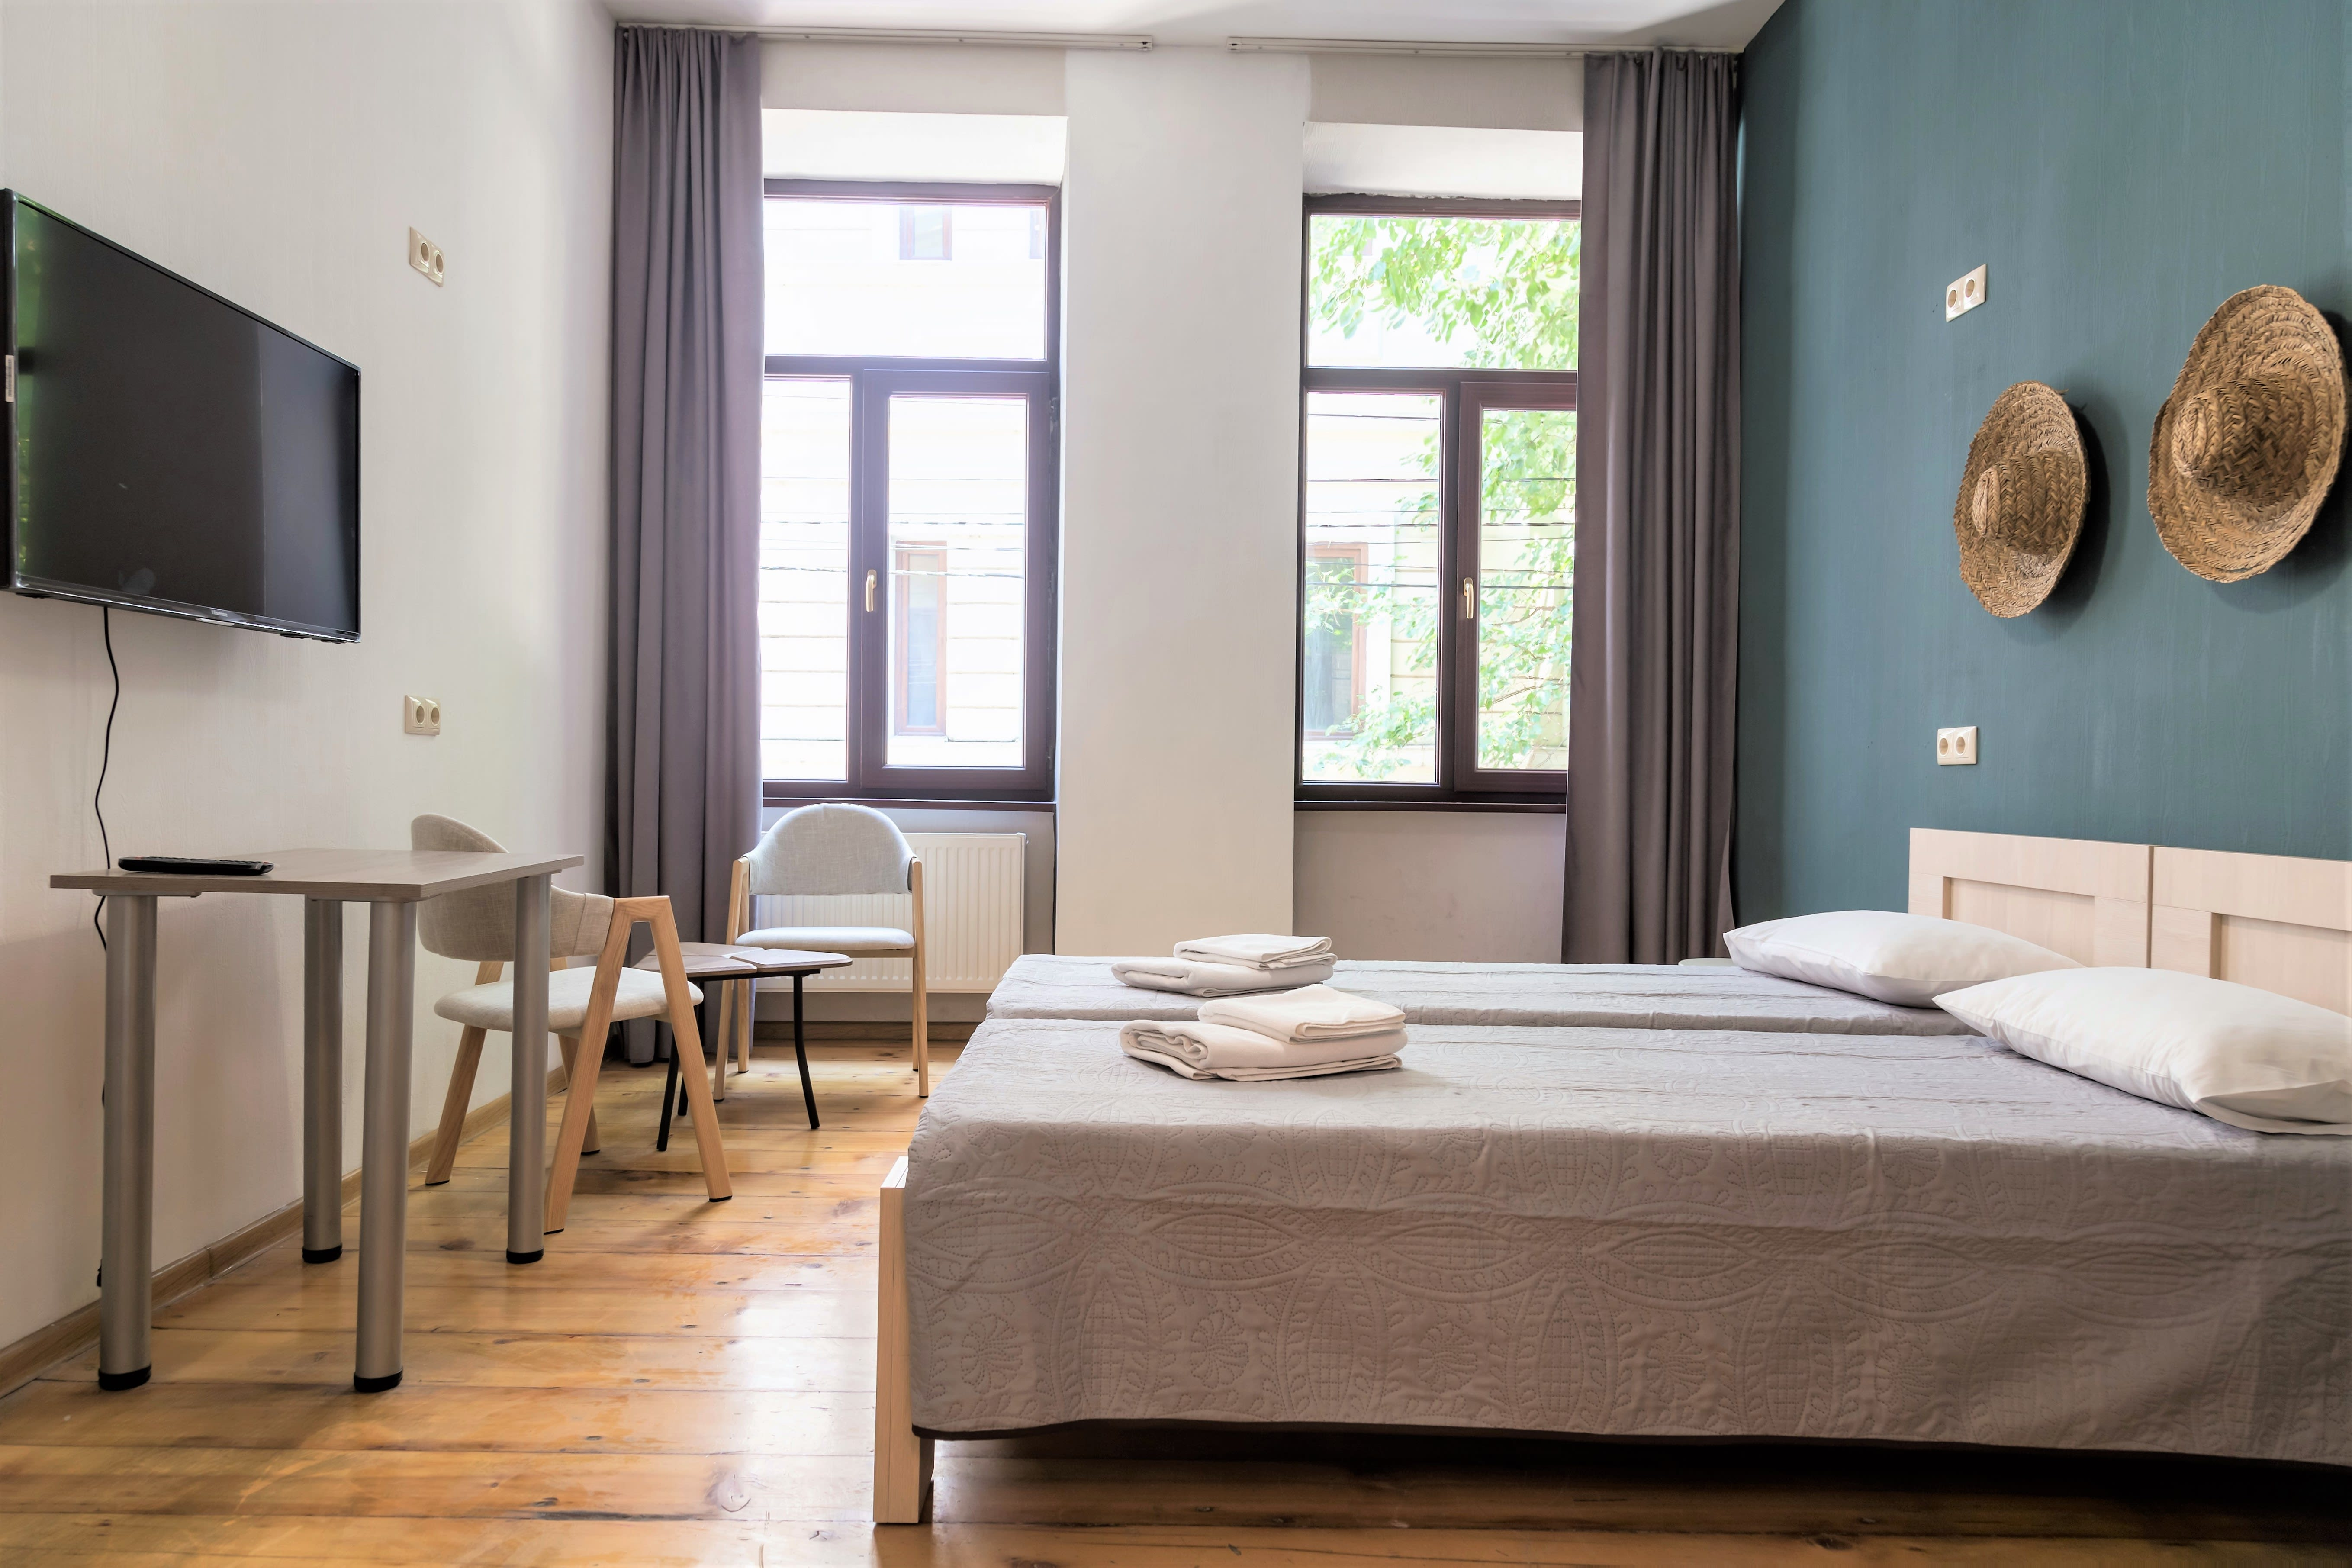 HOSTEL - Gallery Hostel Tbilisi